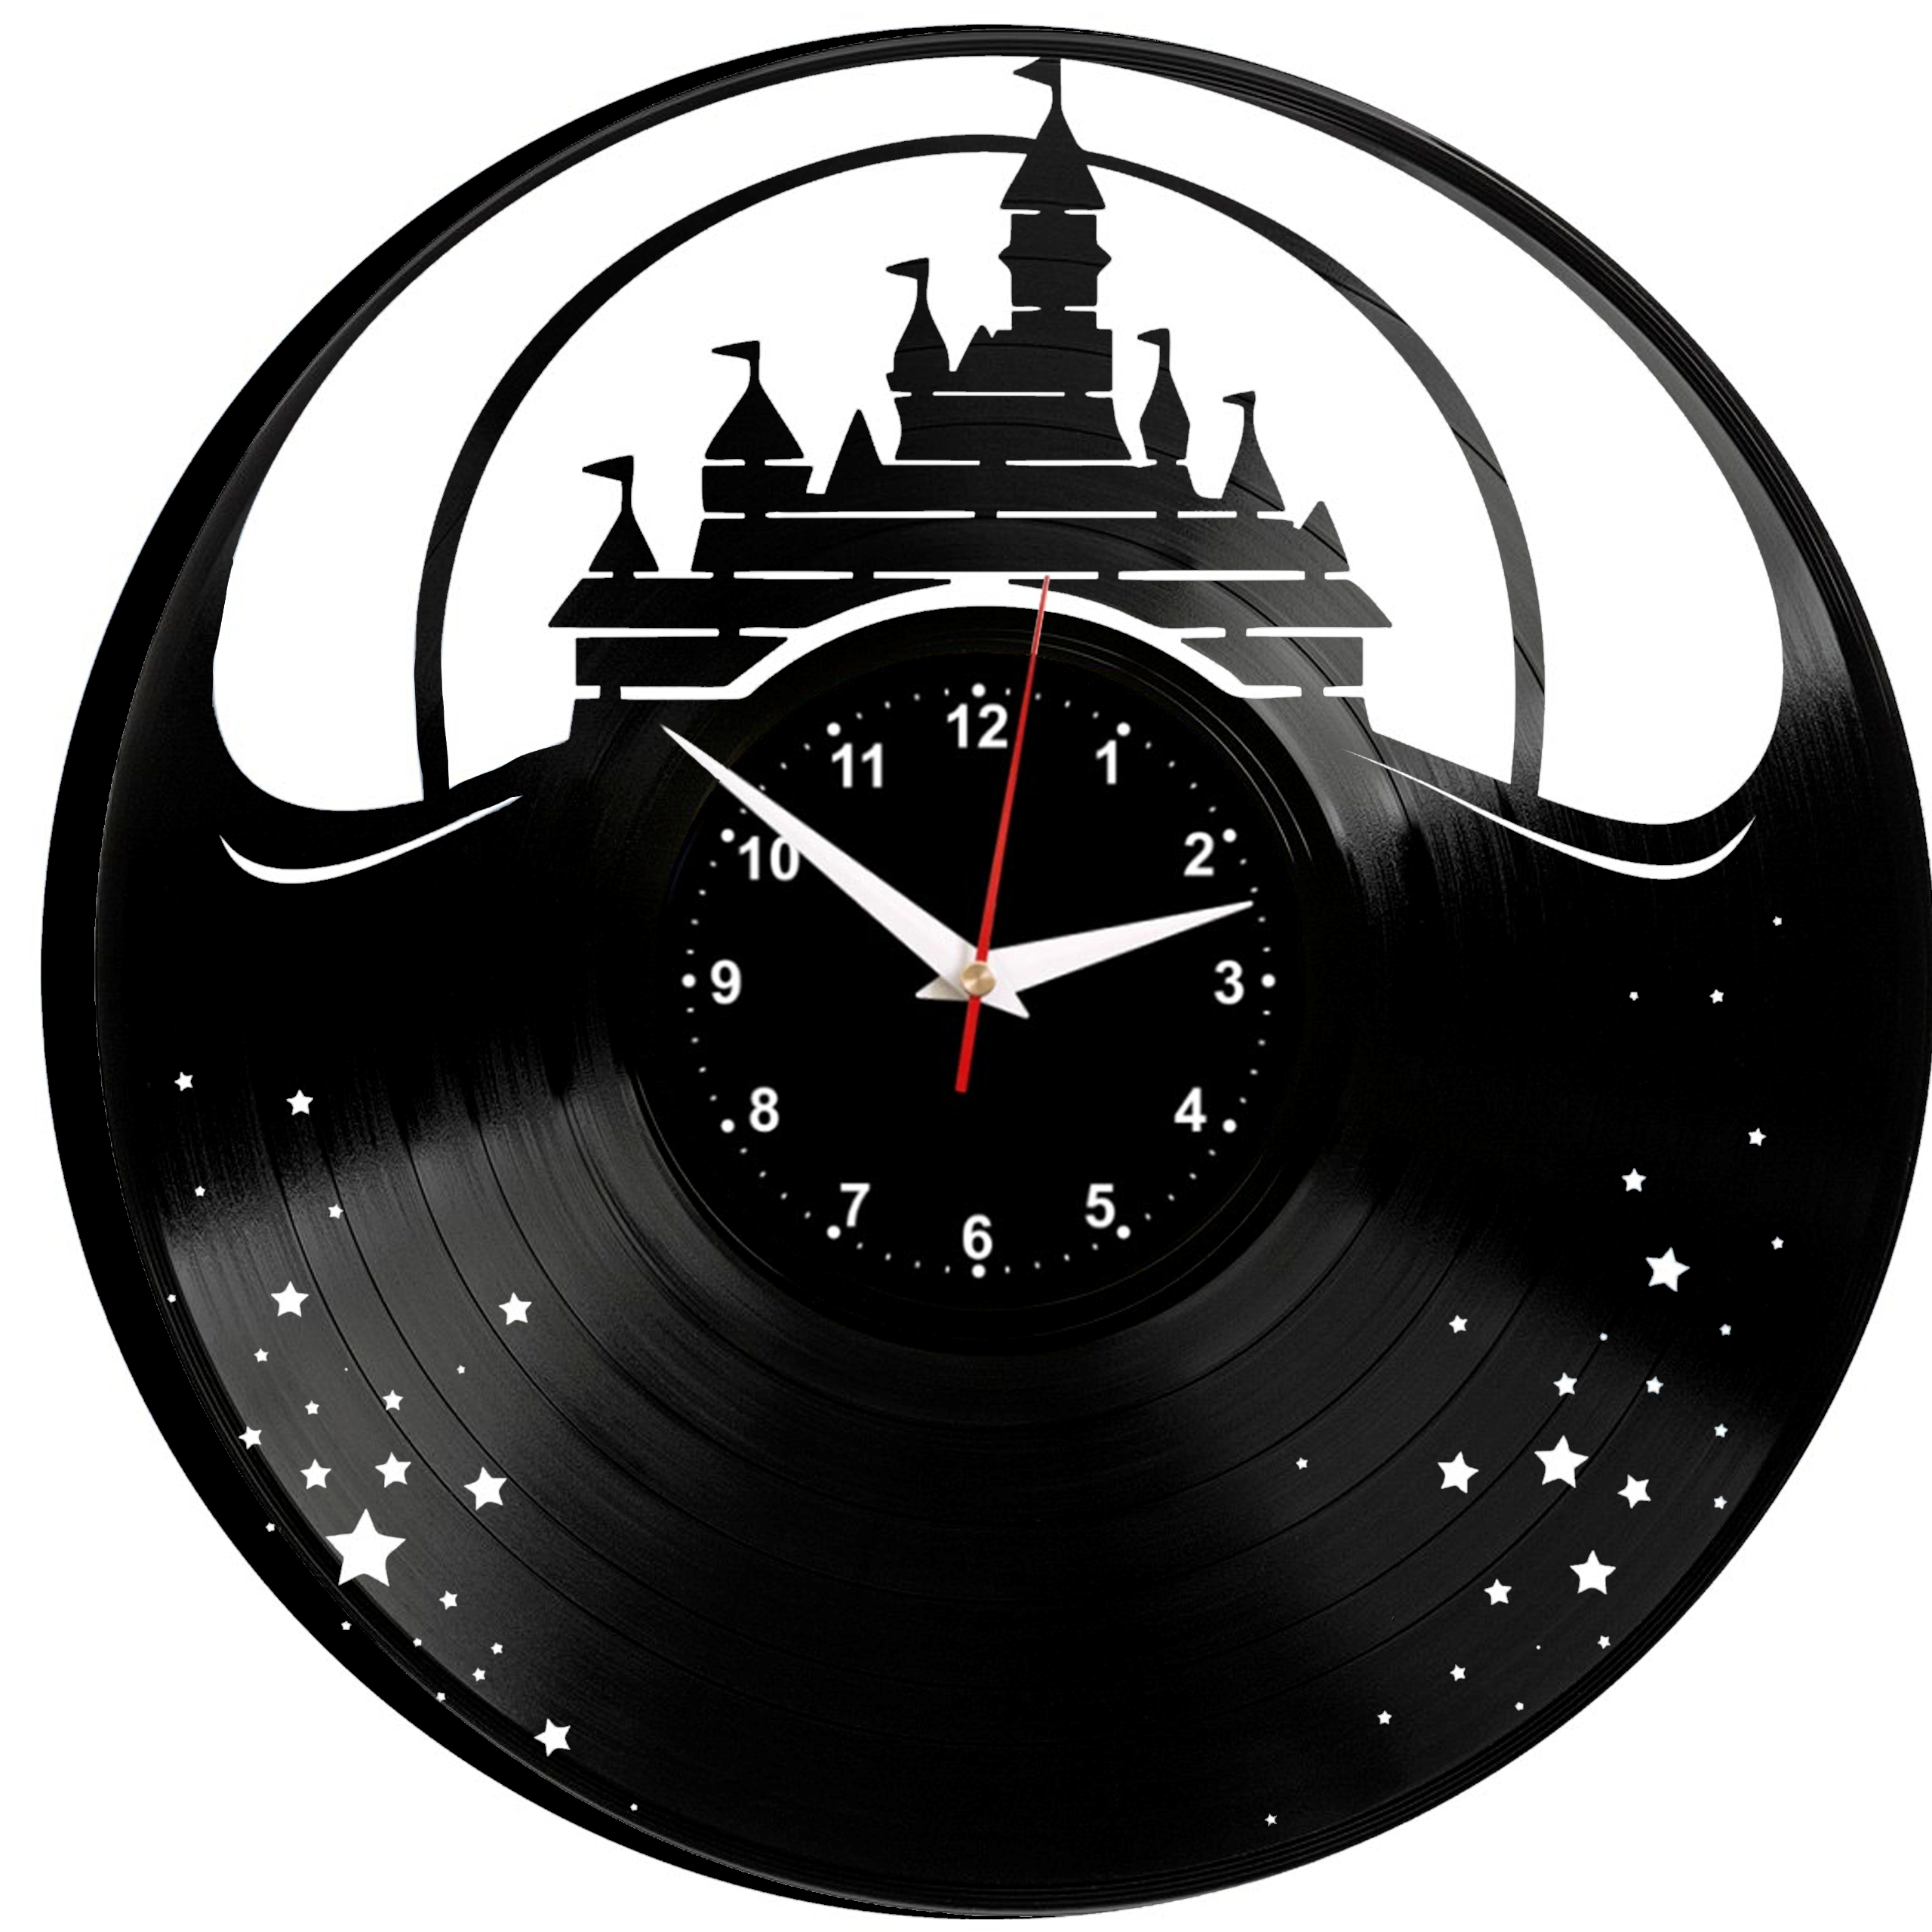 WALT DISNEY Wall Clock Vinyl Vinyl Record Retro Clock Handmade Vintage Gift Style Room Home Decorations Great Gift Clock